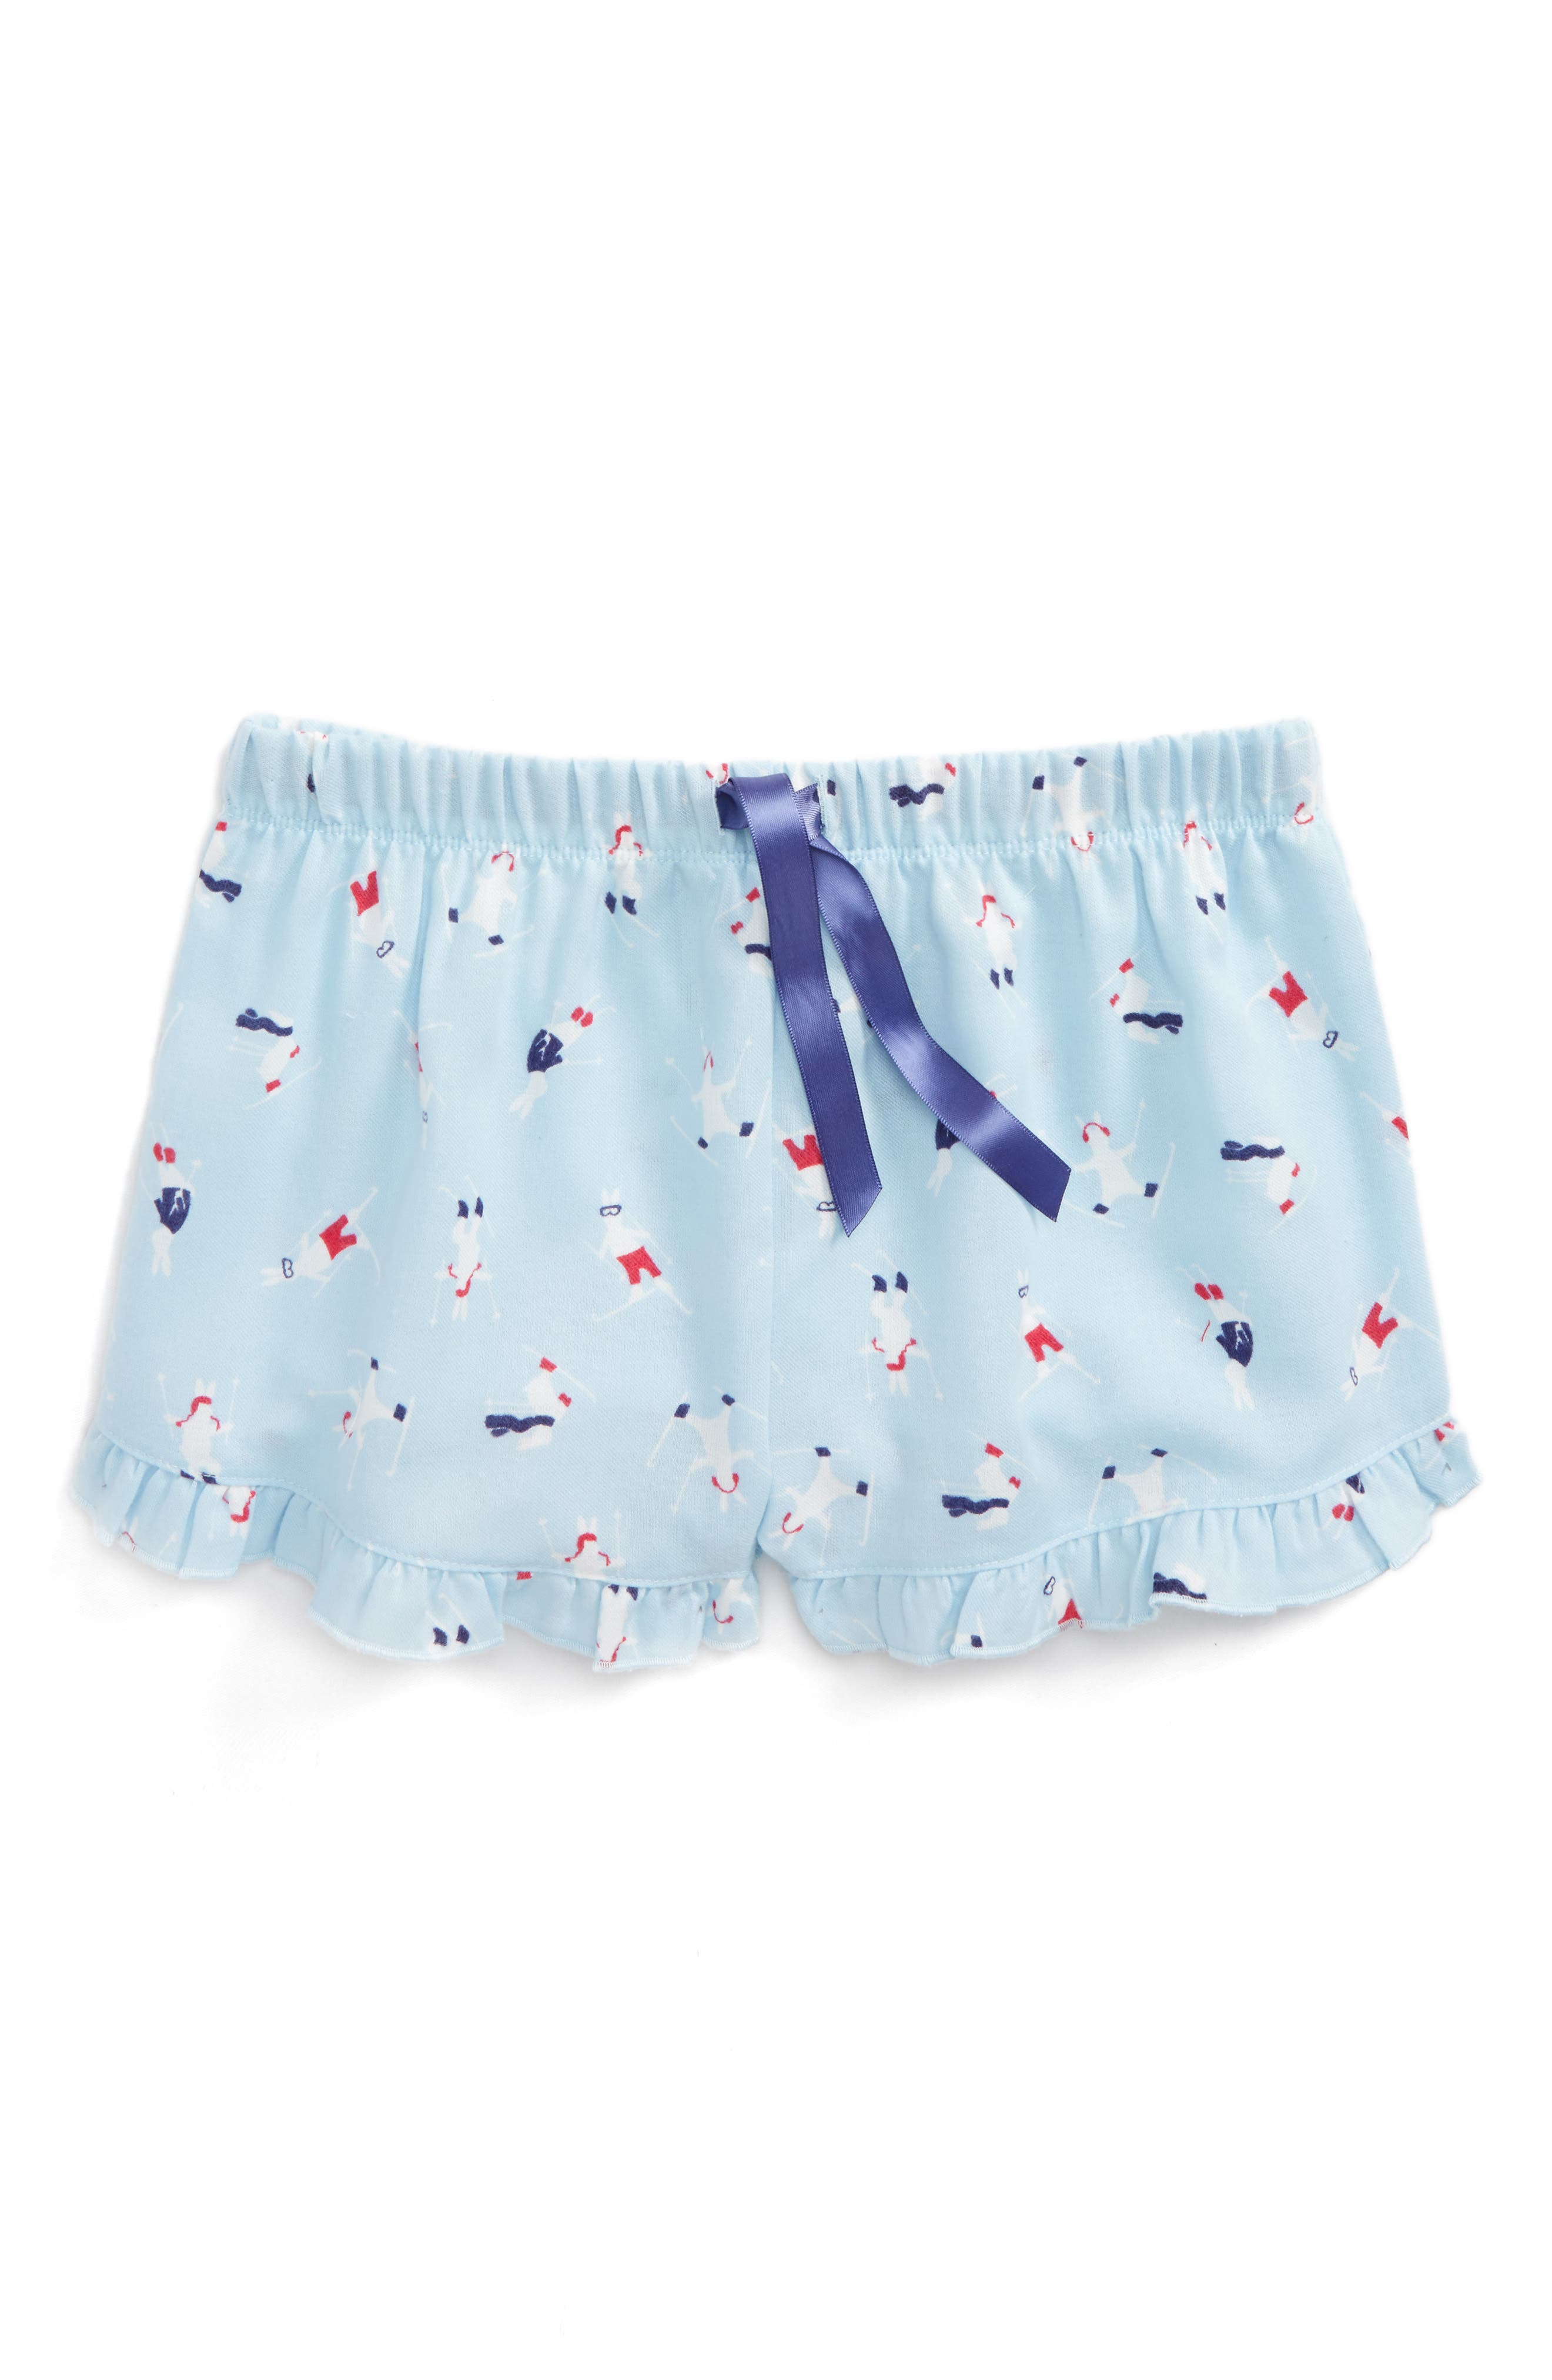 Flannel Shorts,                             Main thumbnail 7, color,